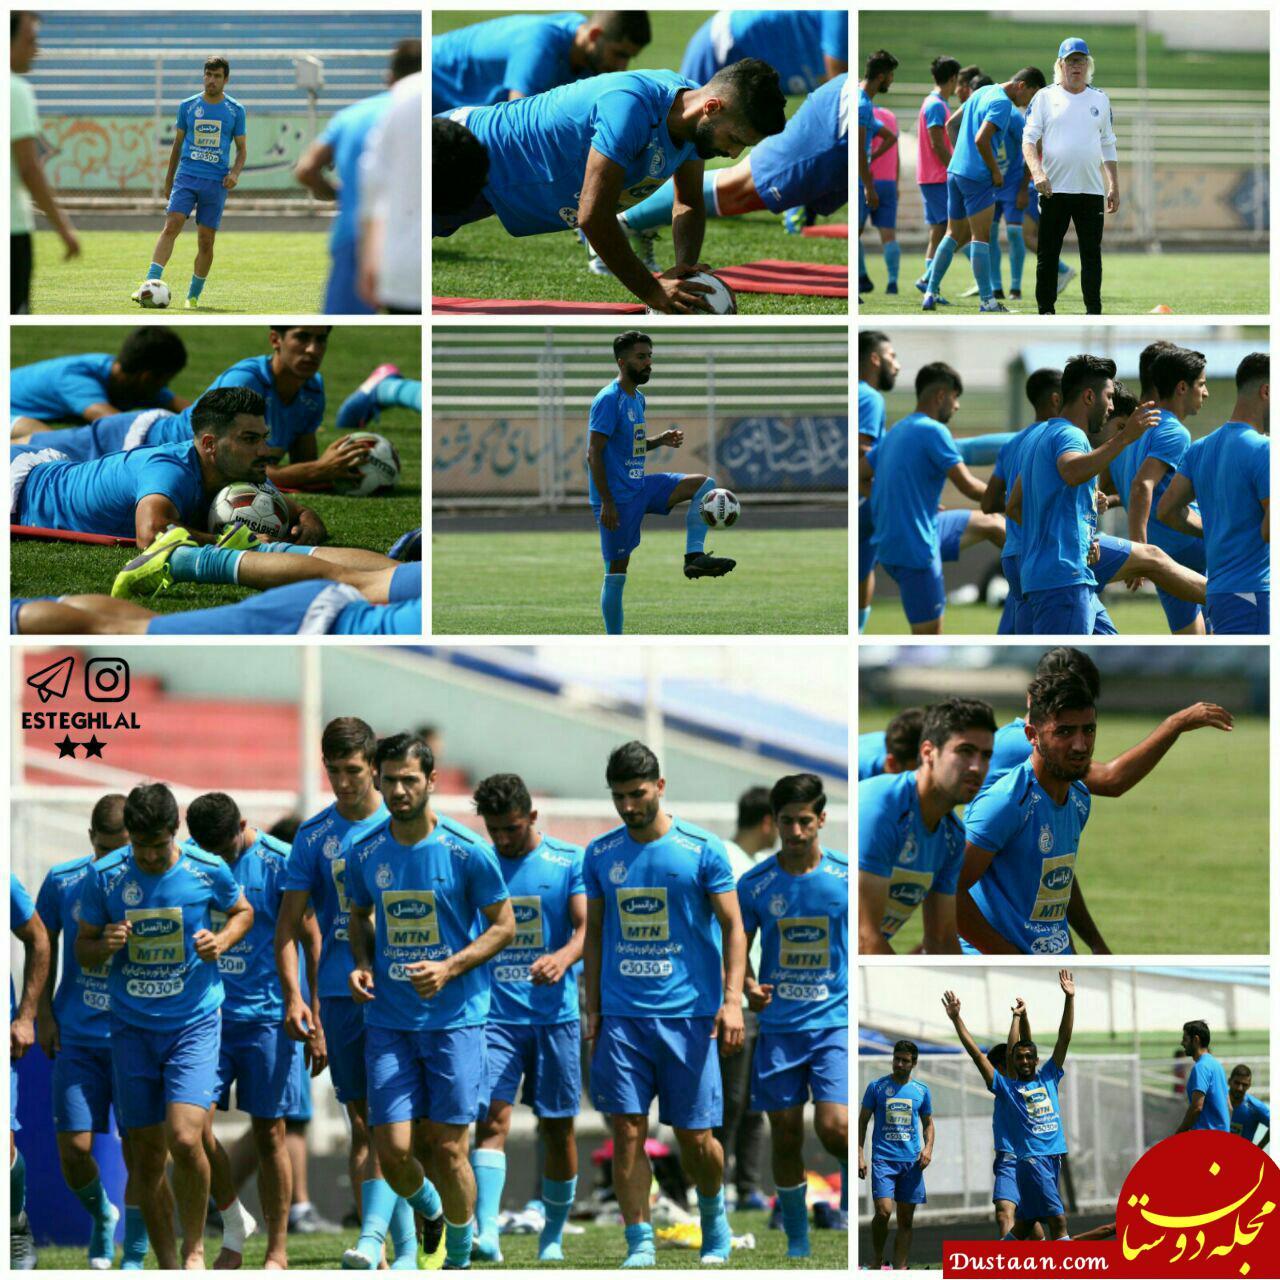 www.dustaan.com دلیل غیبت کریمی در تمرین امروز استقلال مشخص شد +عکس